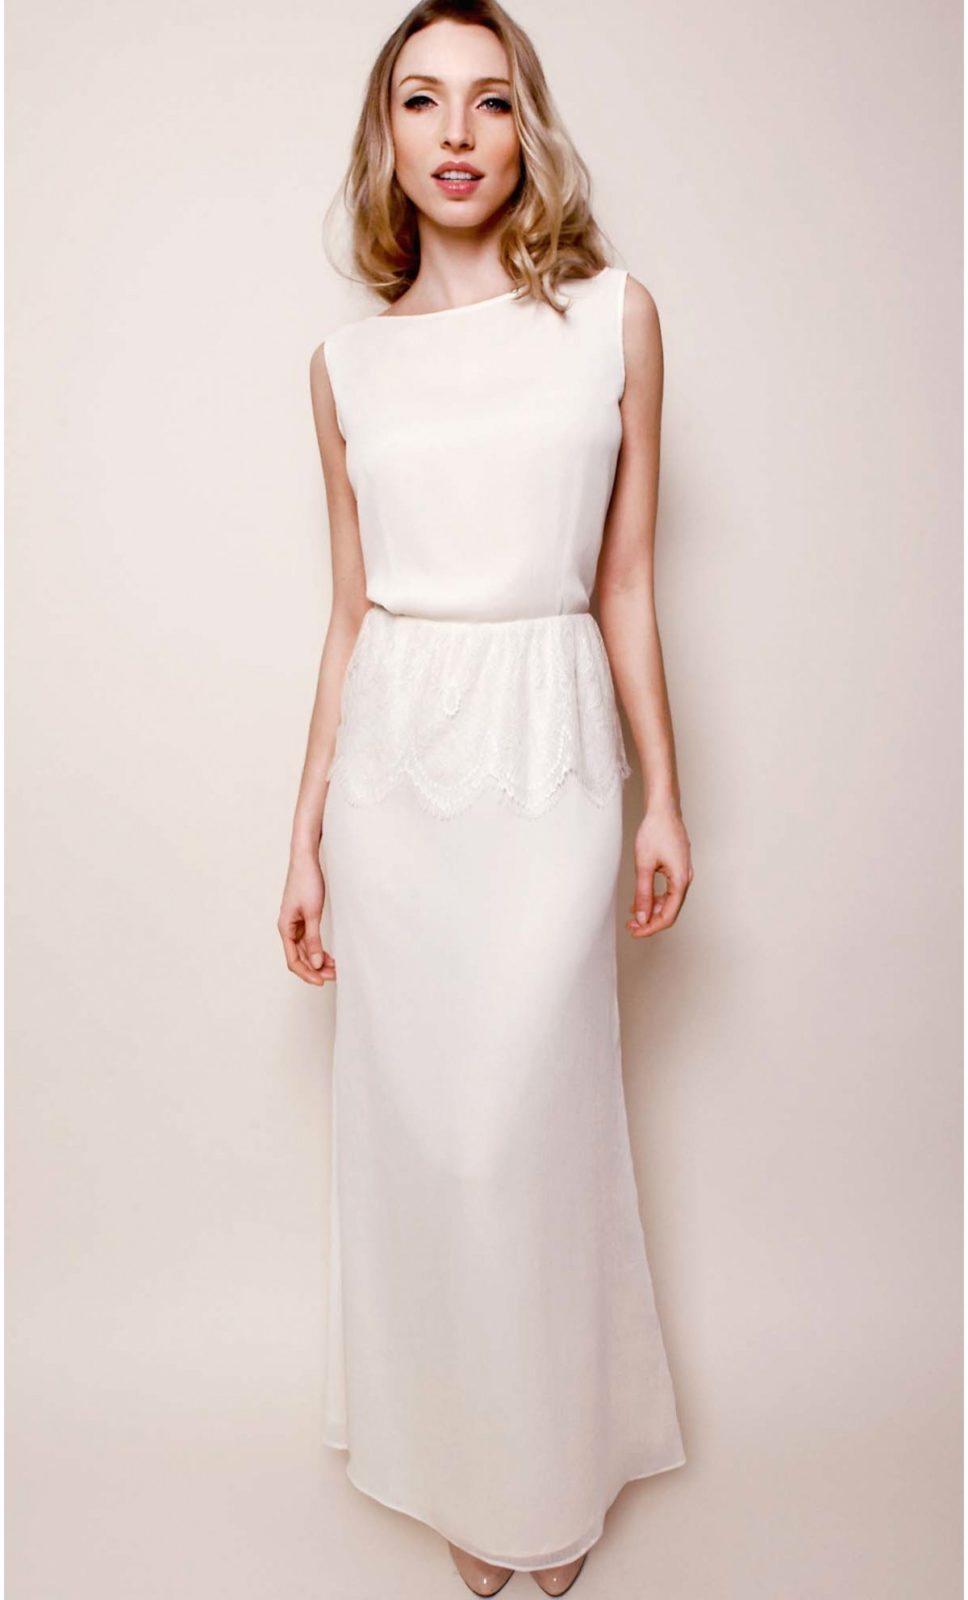 Robe longue blanche vintage